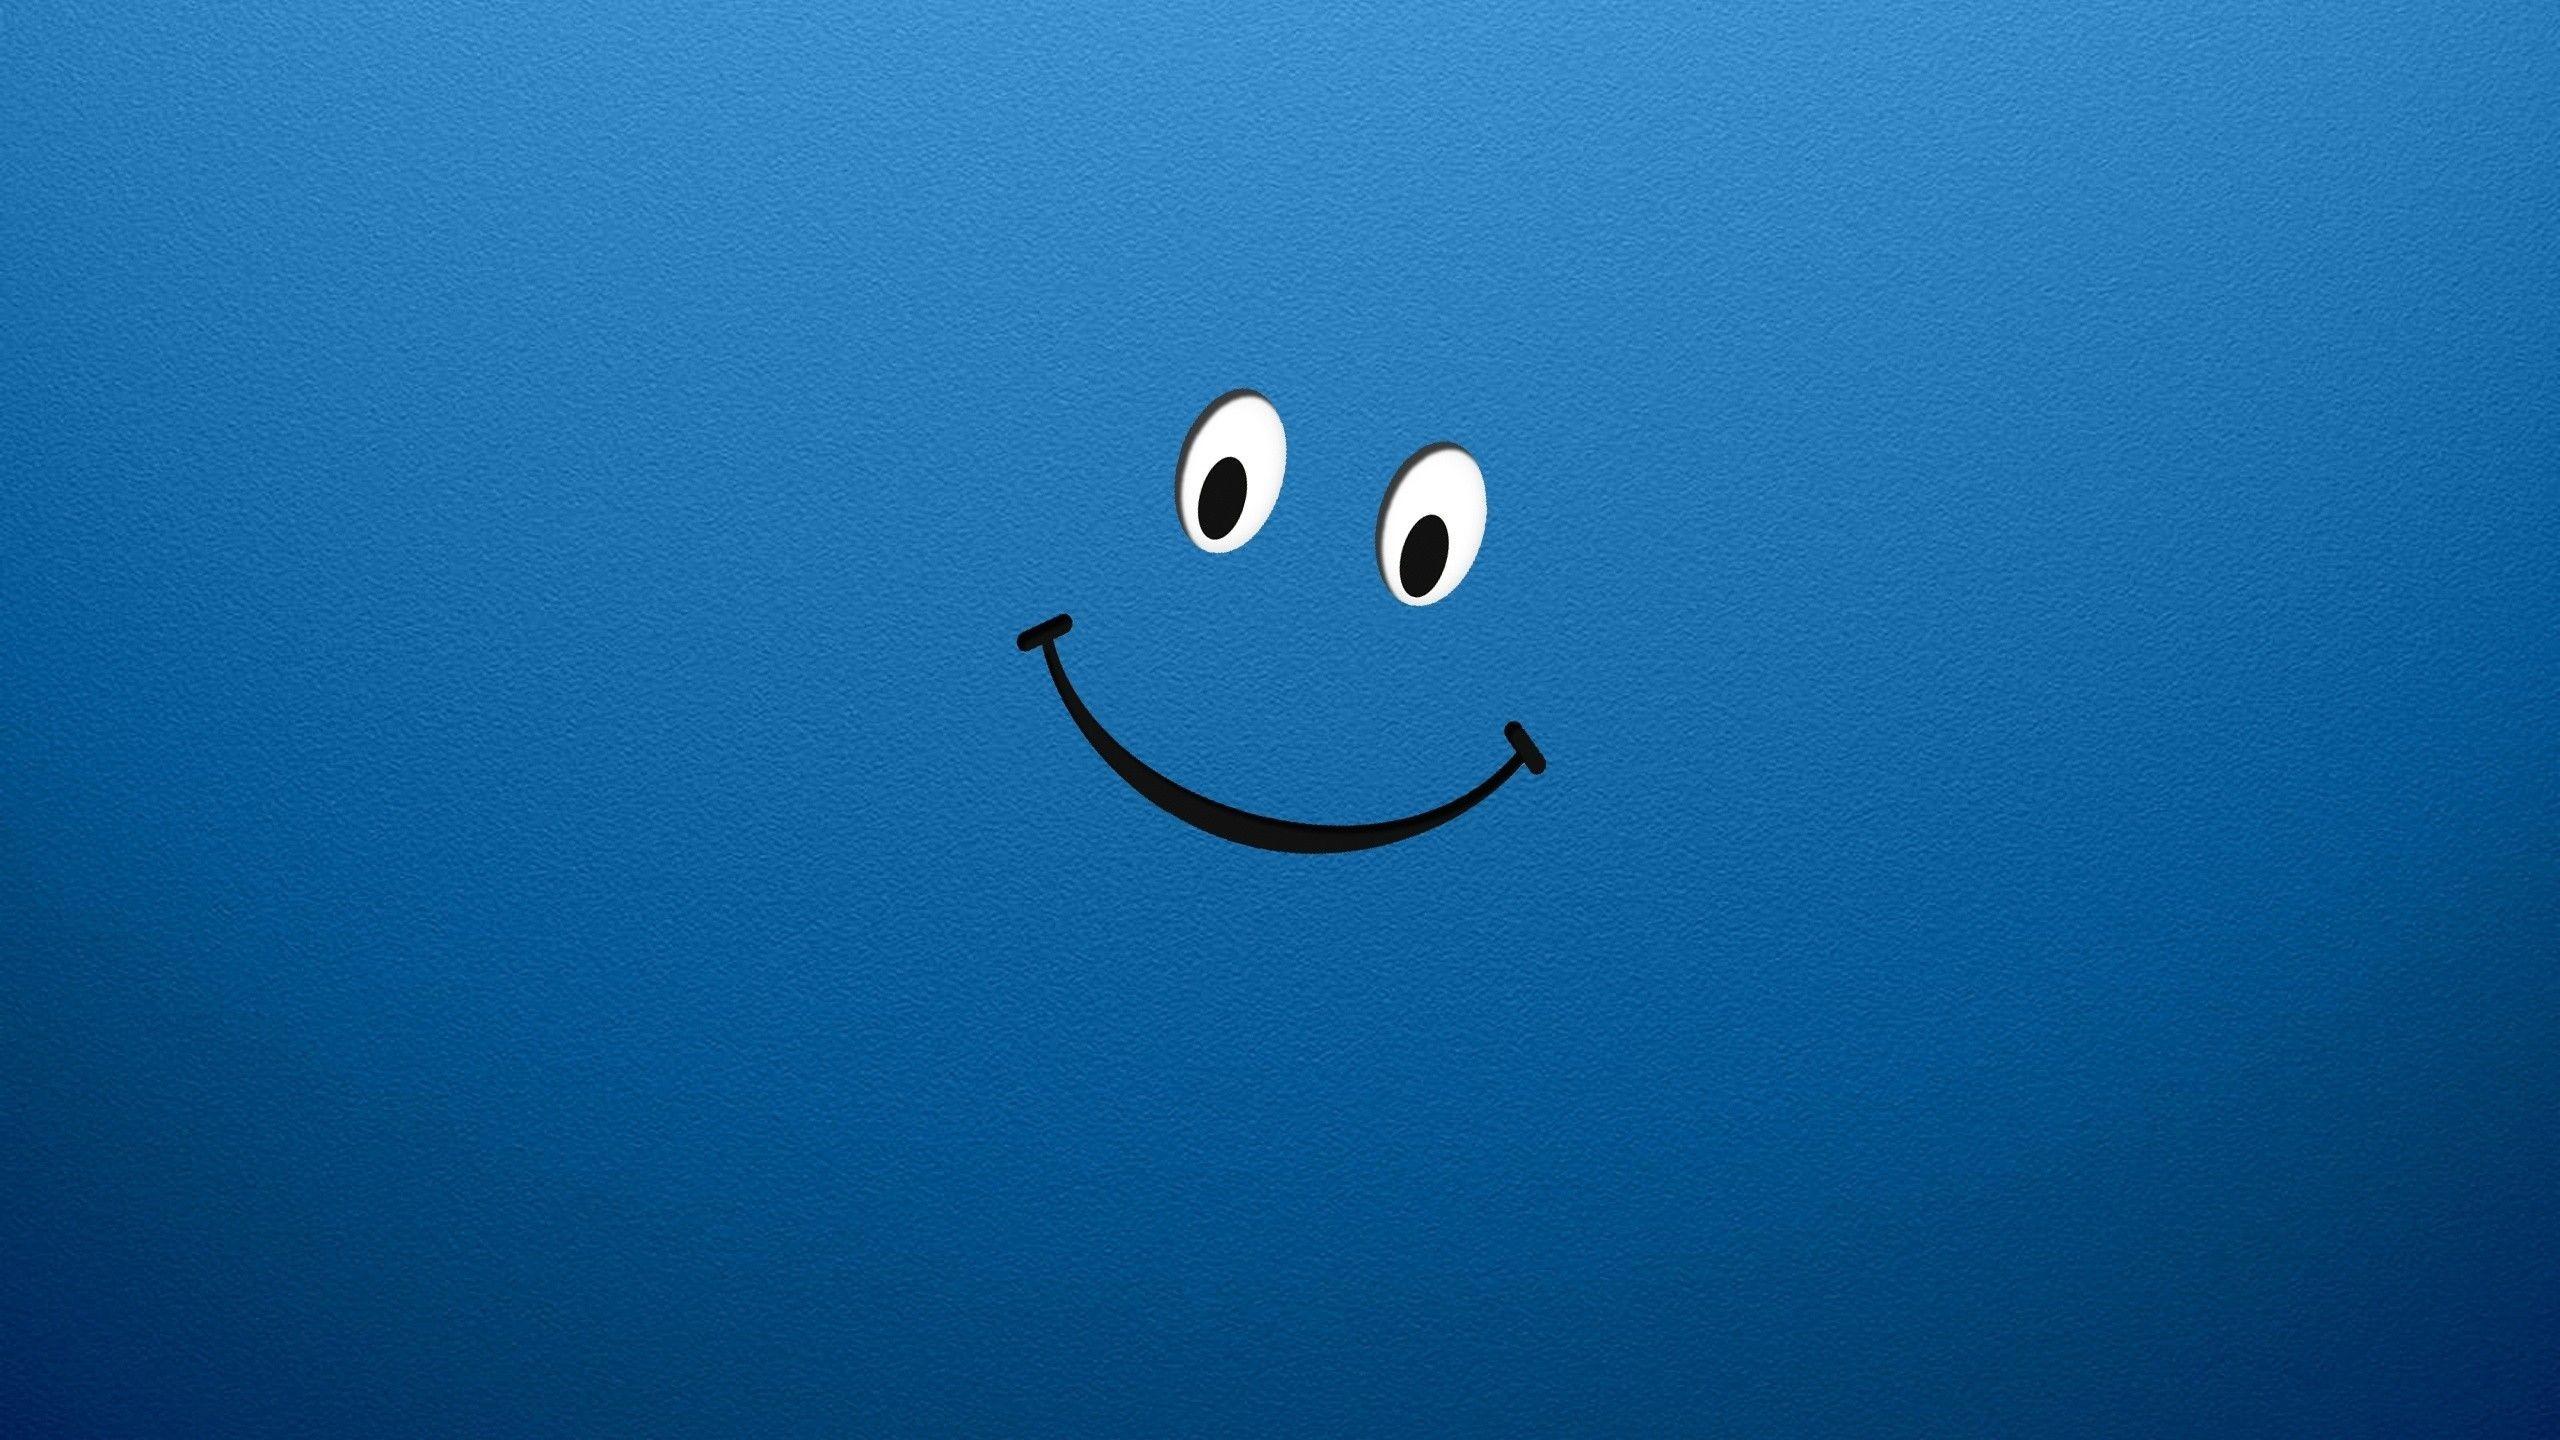 Emoji Face Wallpaper 54 images 2560x1440